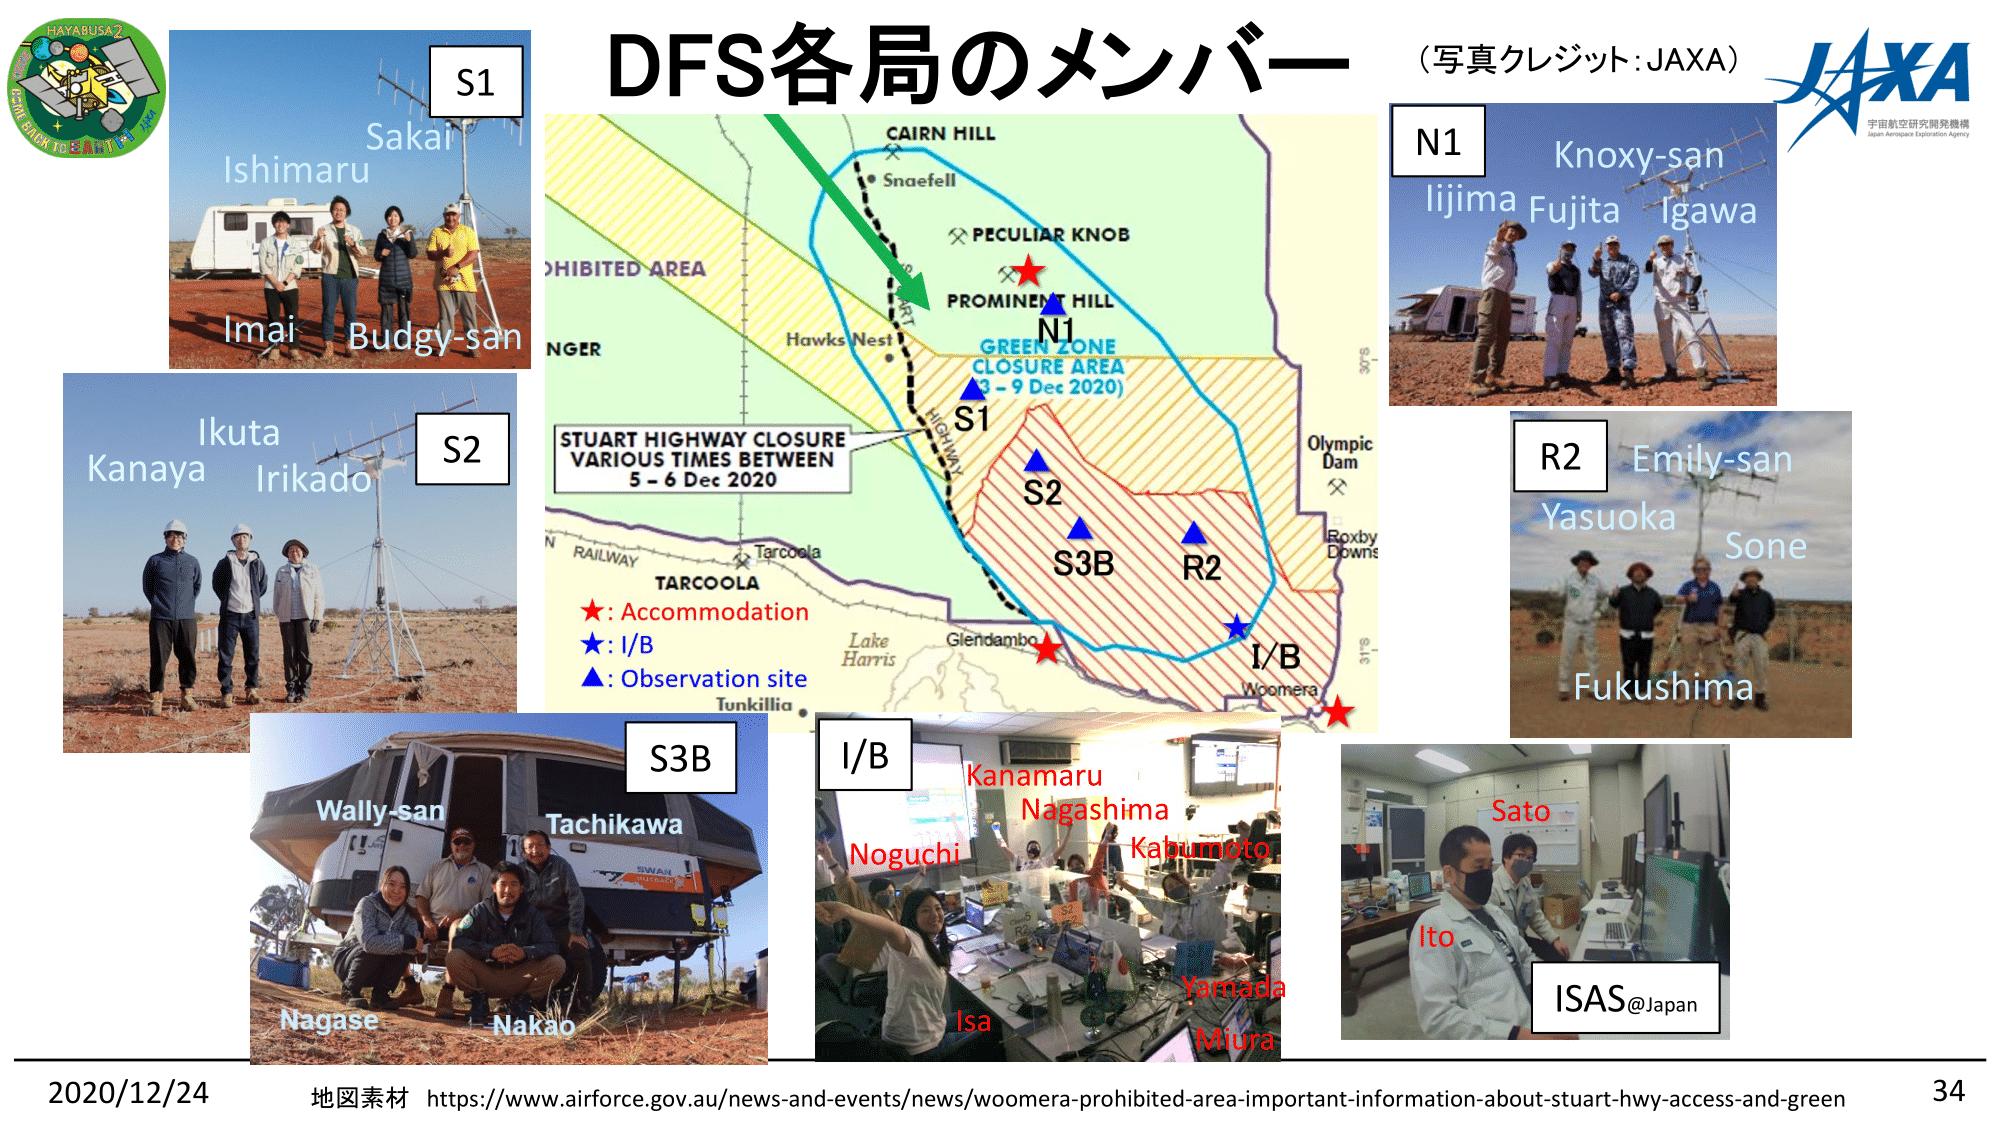 f:id:Imamura:20201224135405p:plain